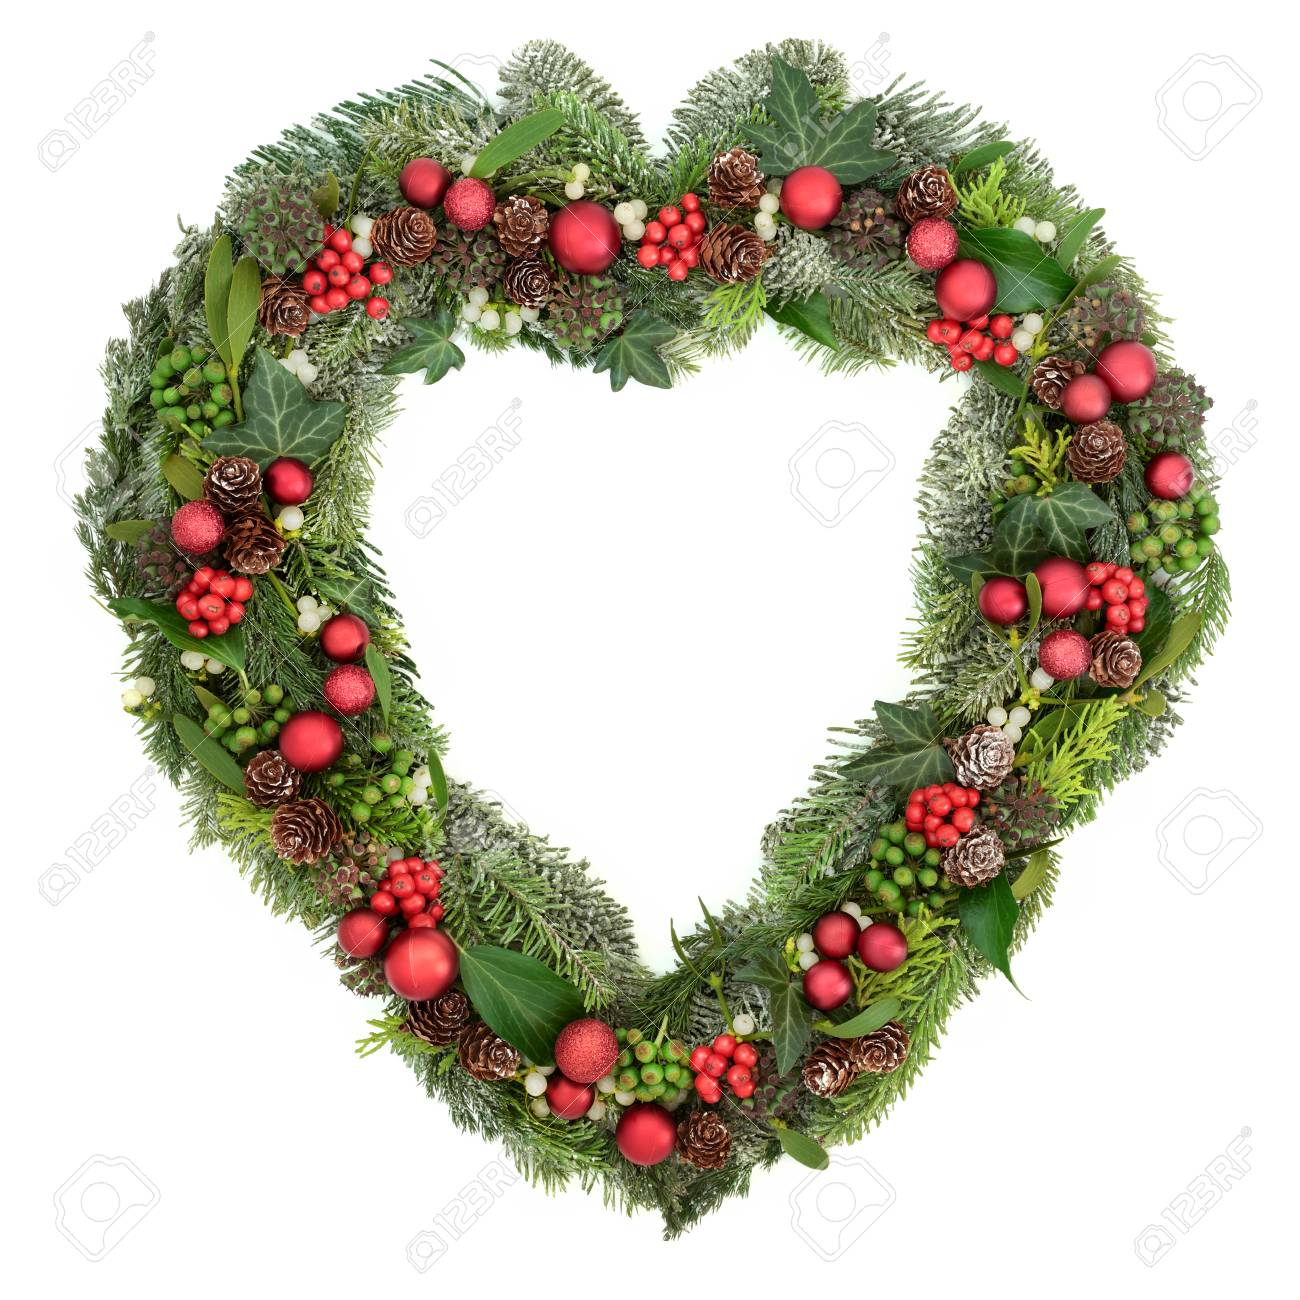 Christmas Heart Wreath.Decorative Heart Shaped Christmas Wreath With Red Bauble Decorations